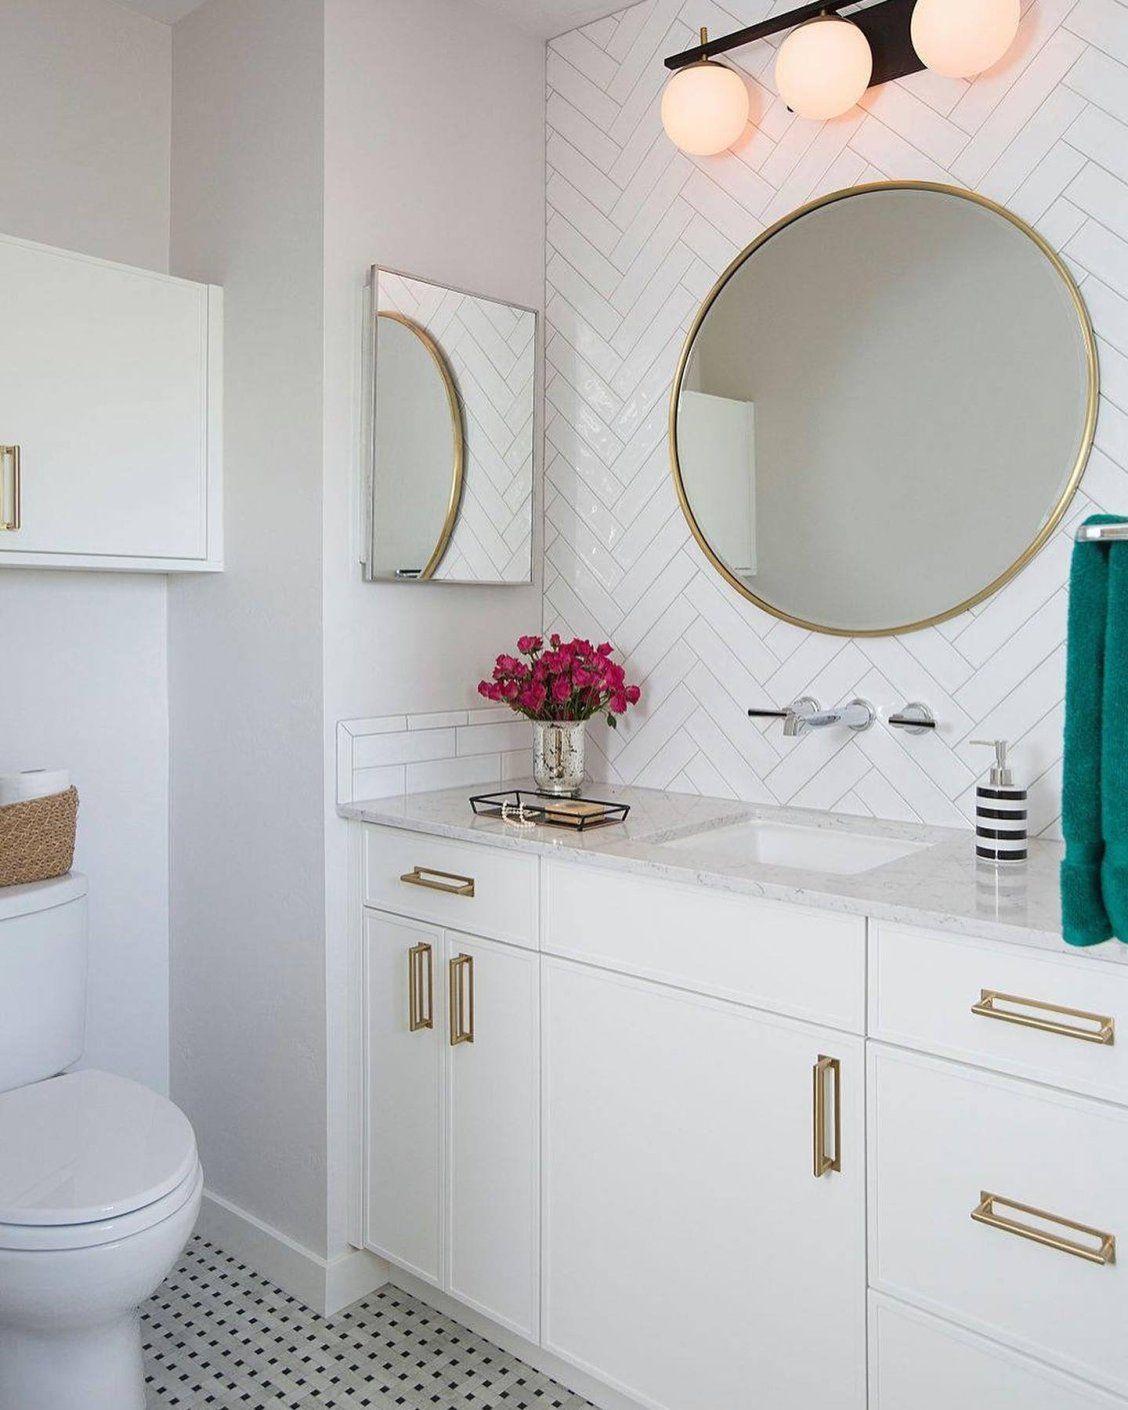 Alluria Bath Bar In 2020 Bathroom Interior Herringbone Tile